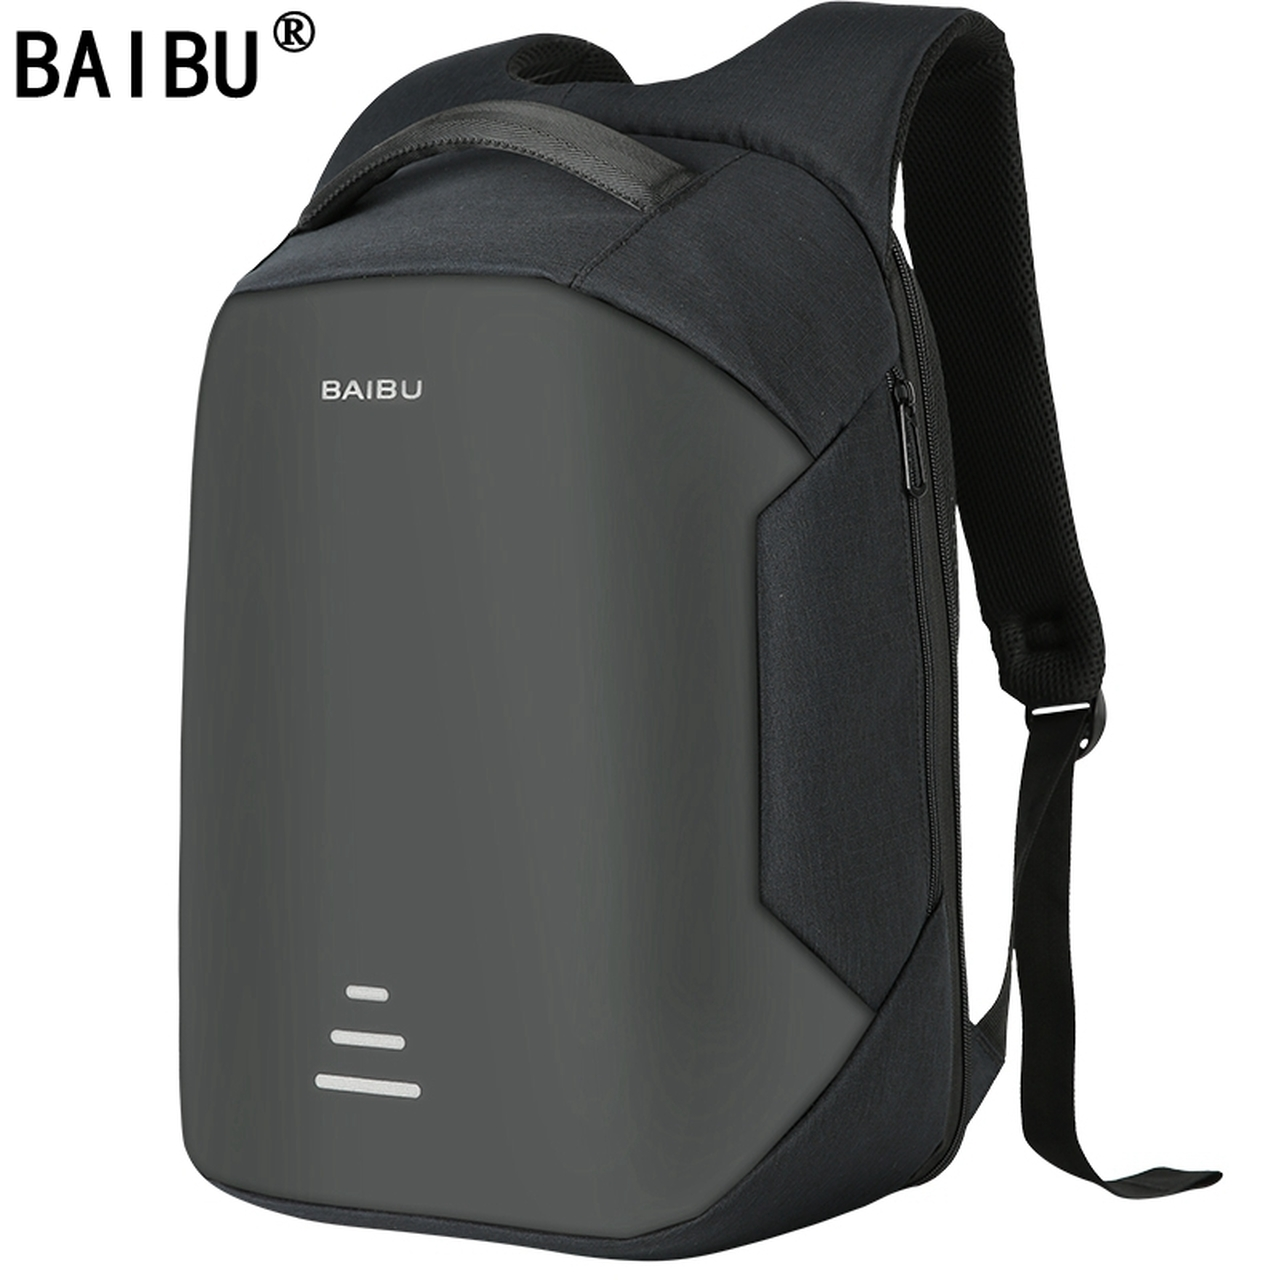 e48c11646a41 BAIBU NEW Men 15.6 Laptop Backpack Anti Theft Backpack Usb Charging Women  School Notebook Bag Oxford Waterproof Travel Backpack